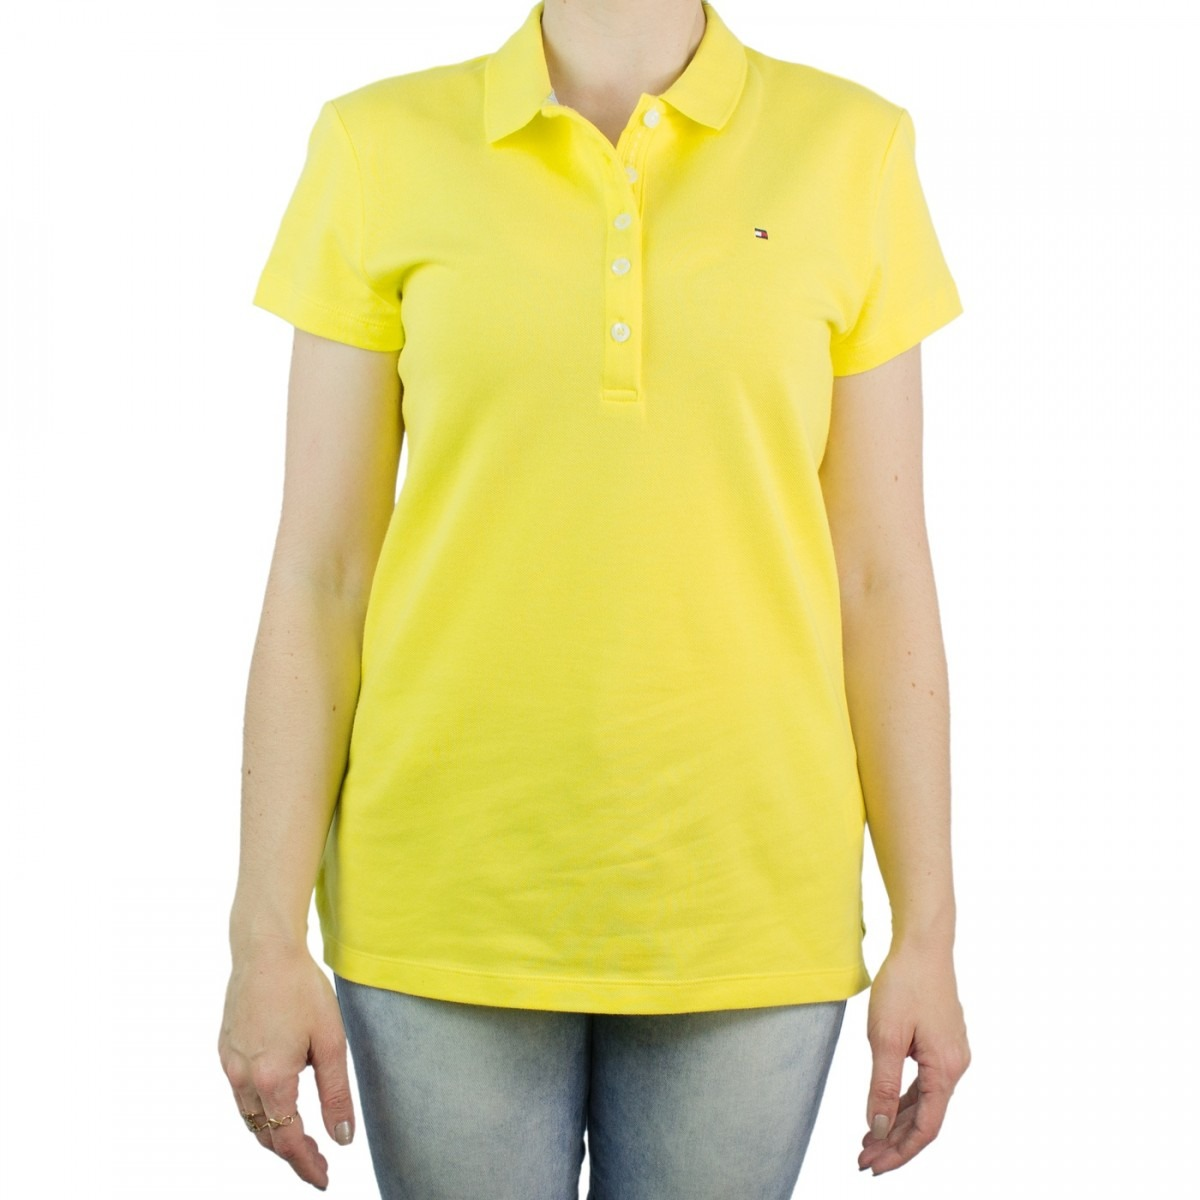 36e45da9d7 camisa polo feminina tommy hilfiger slim fit th1m87657752. Carregando zoom.